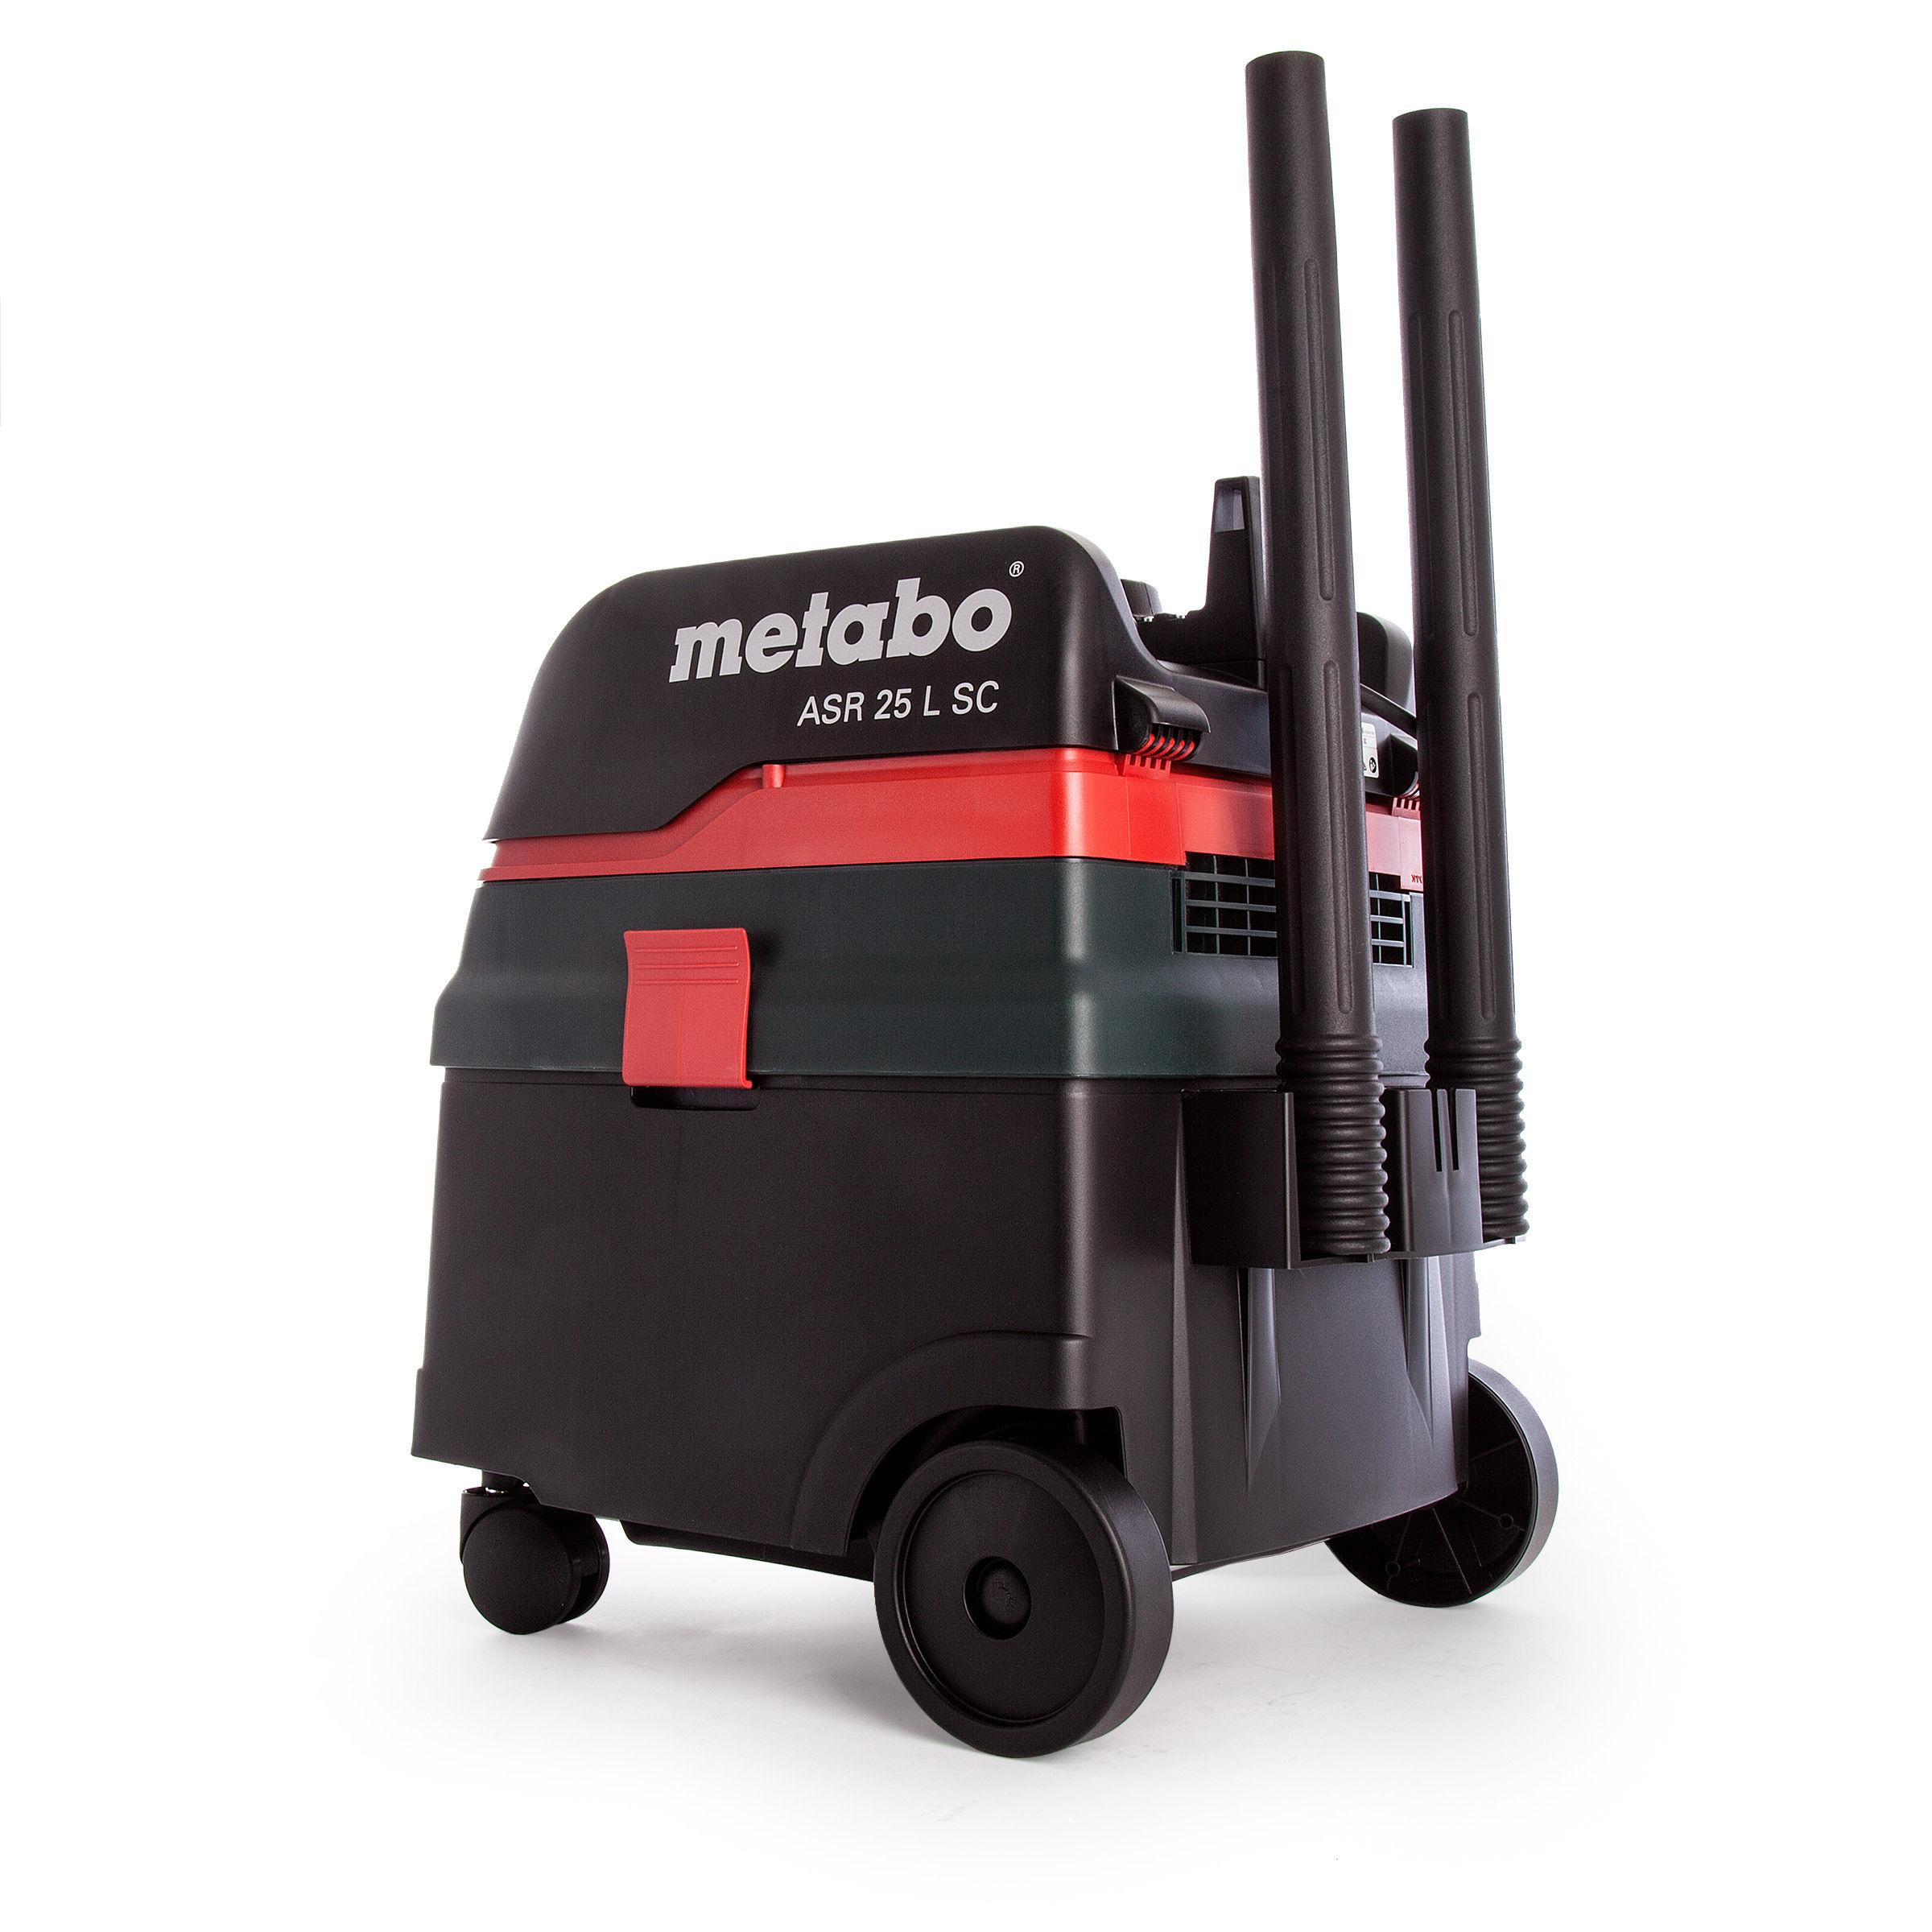 Toolstop Metabo Asr25lsc All Purpose Vacuum Cleaner 110v